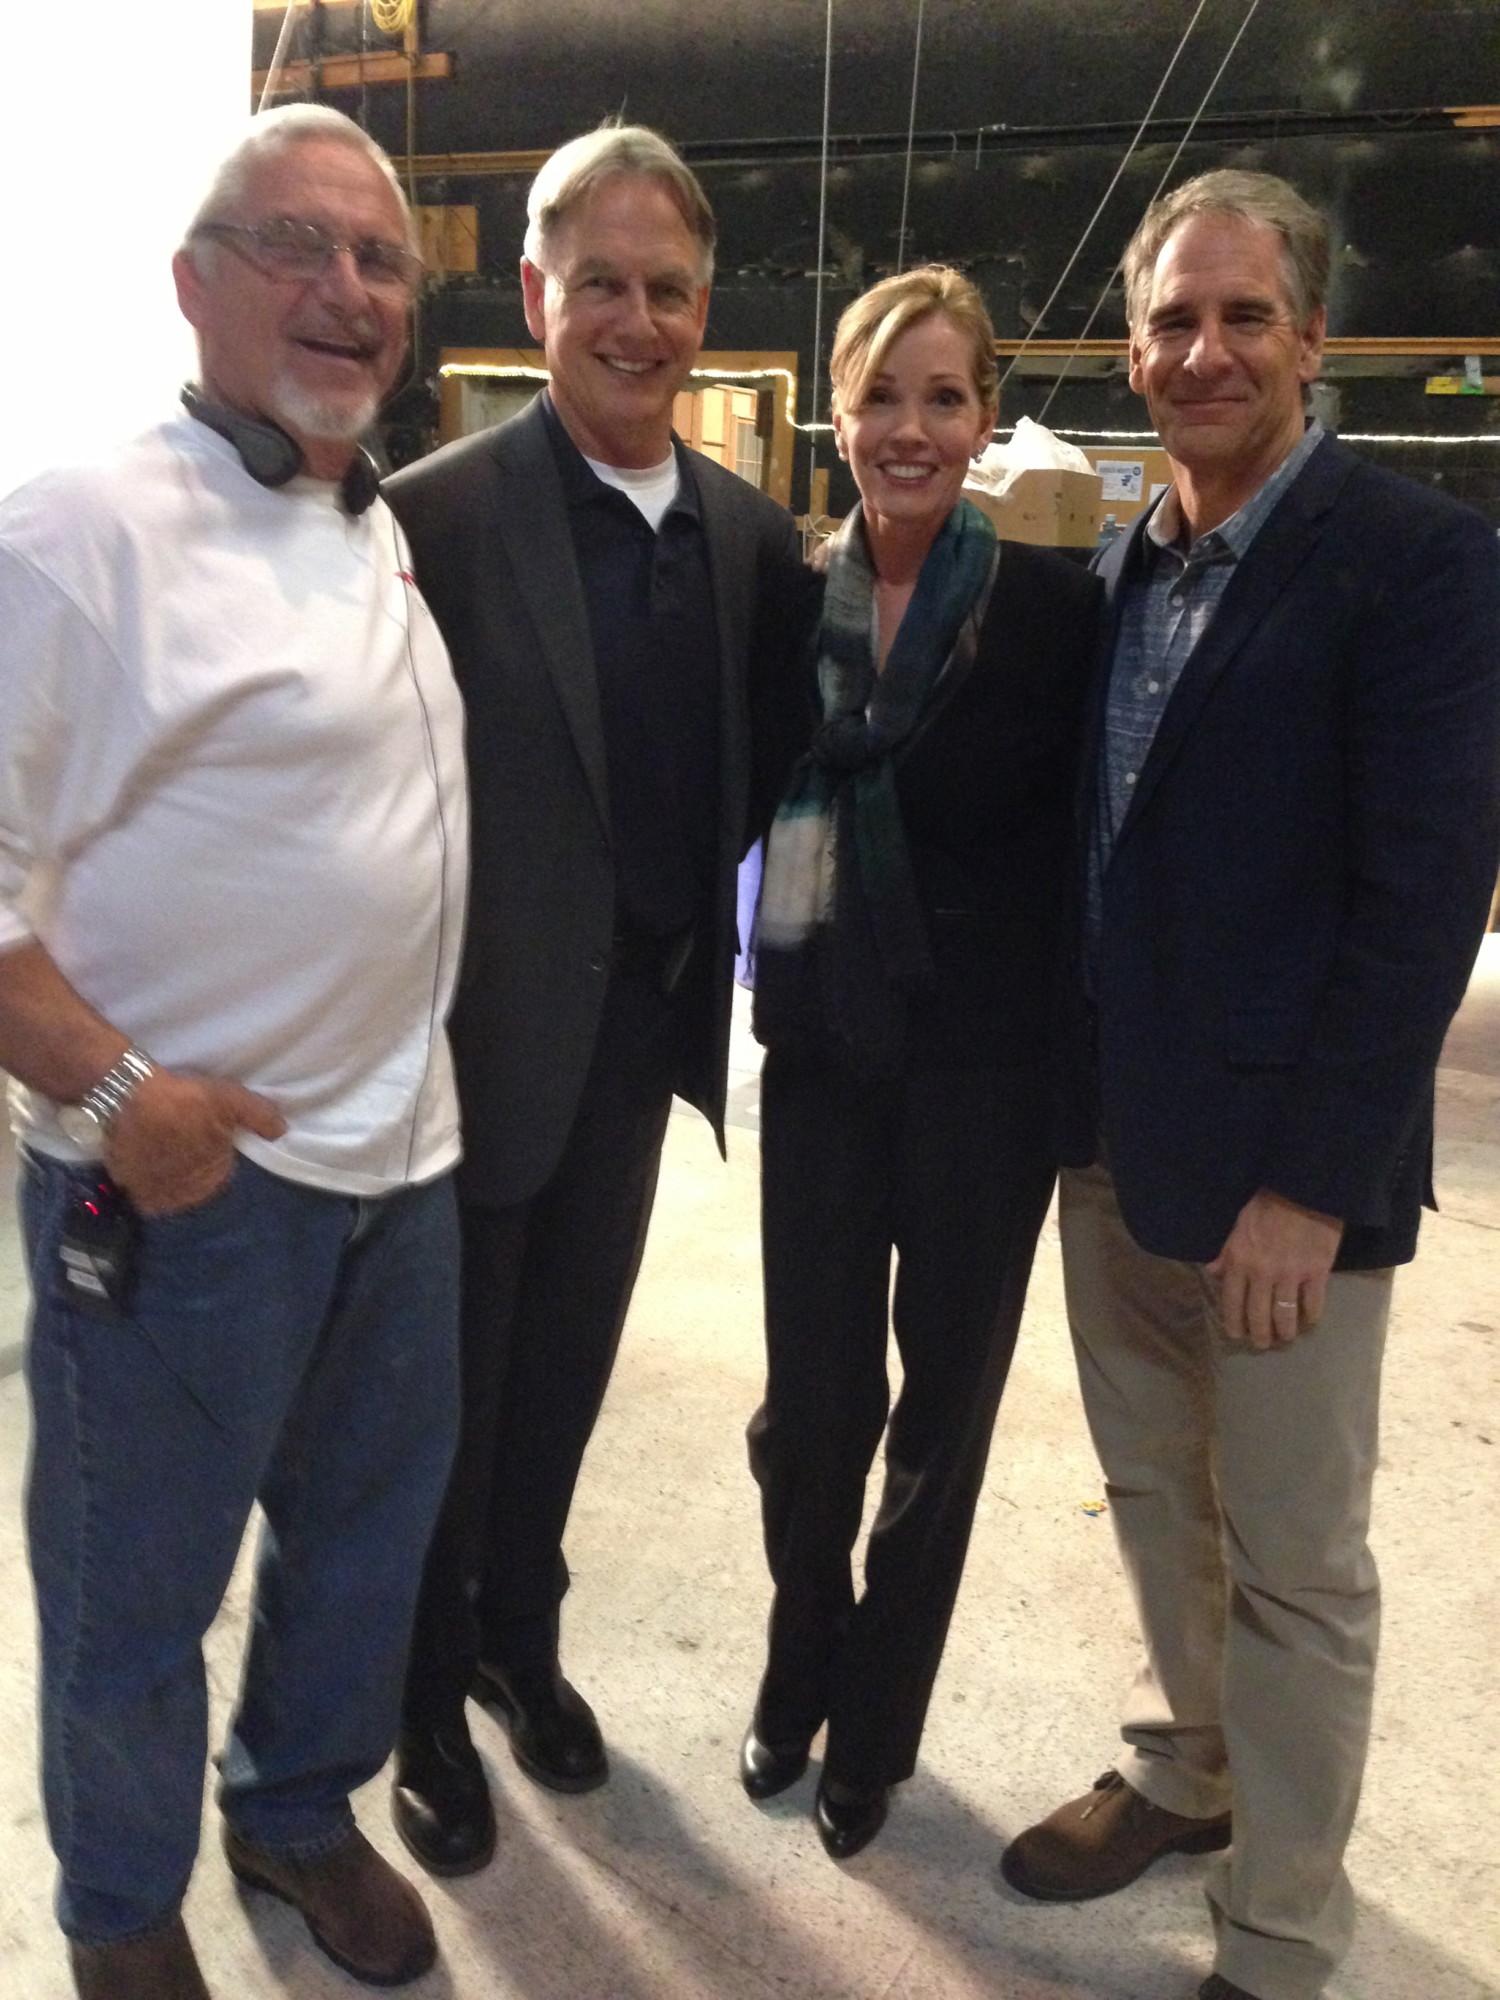 Feb. 2014 — Jimmy Whitmore, Mark Harmon, me, Scott Bakula